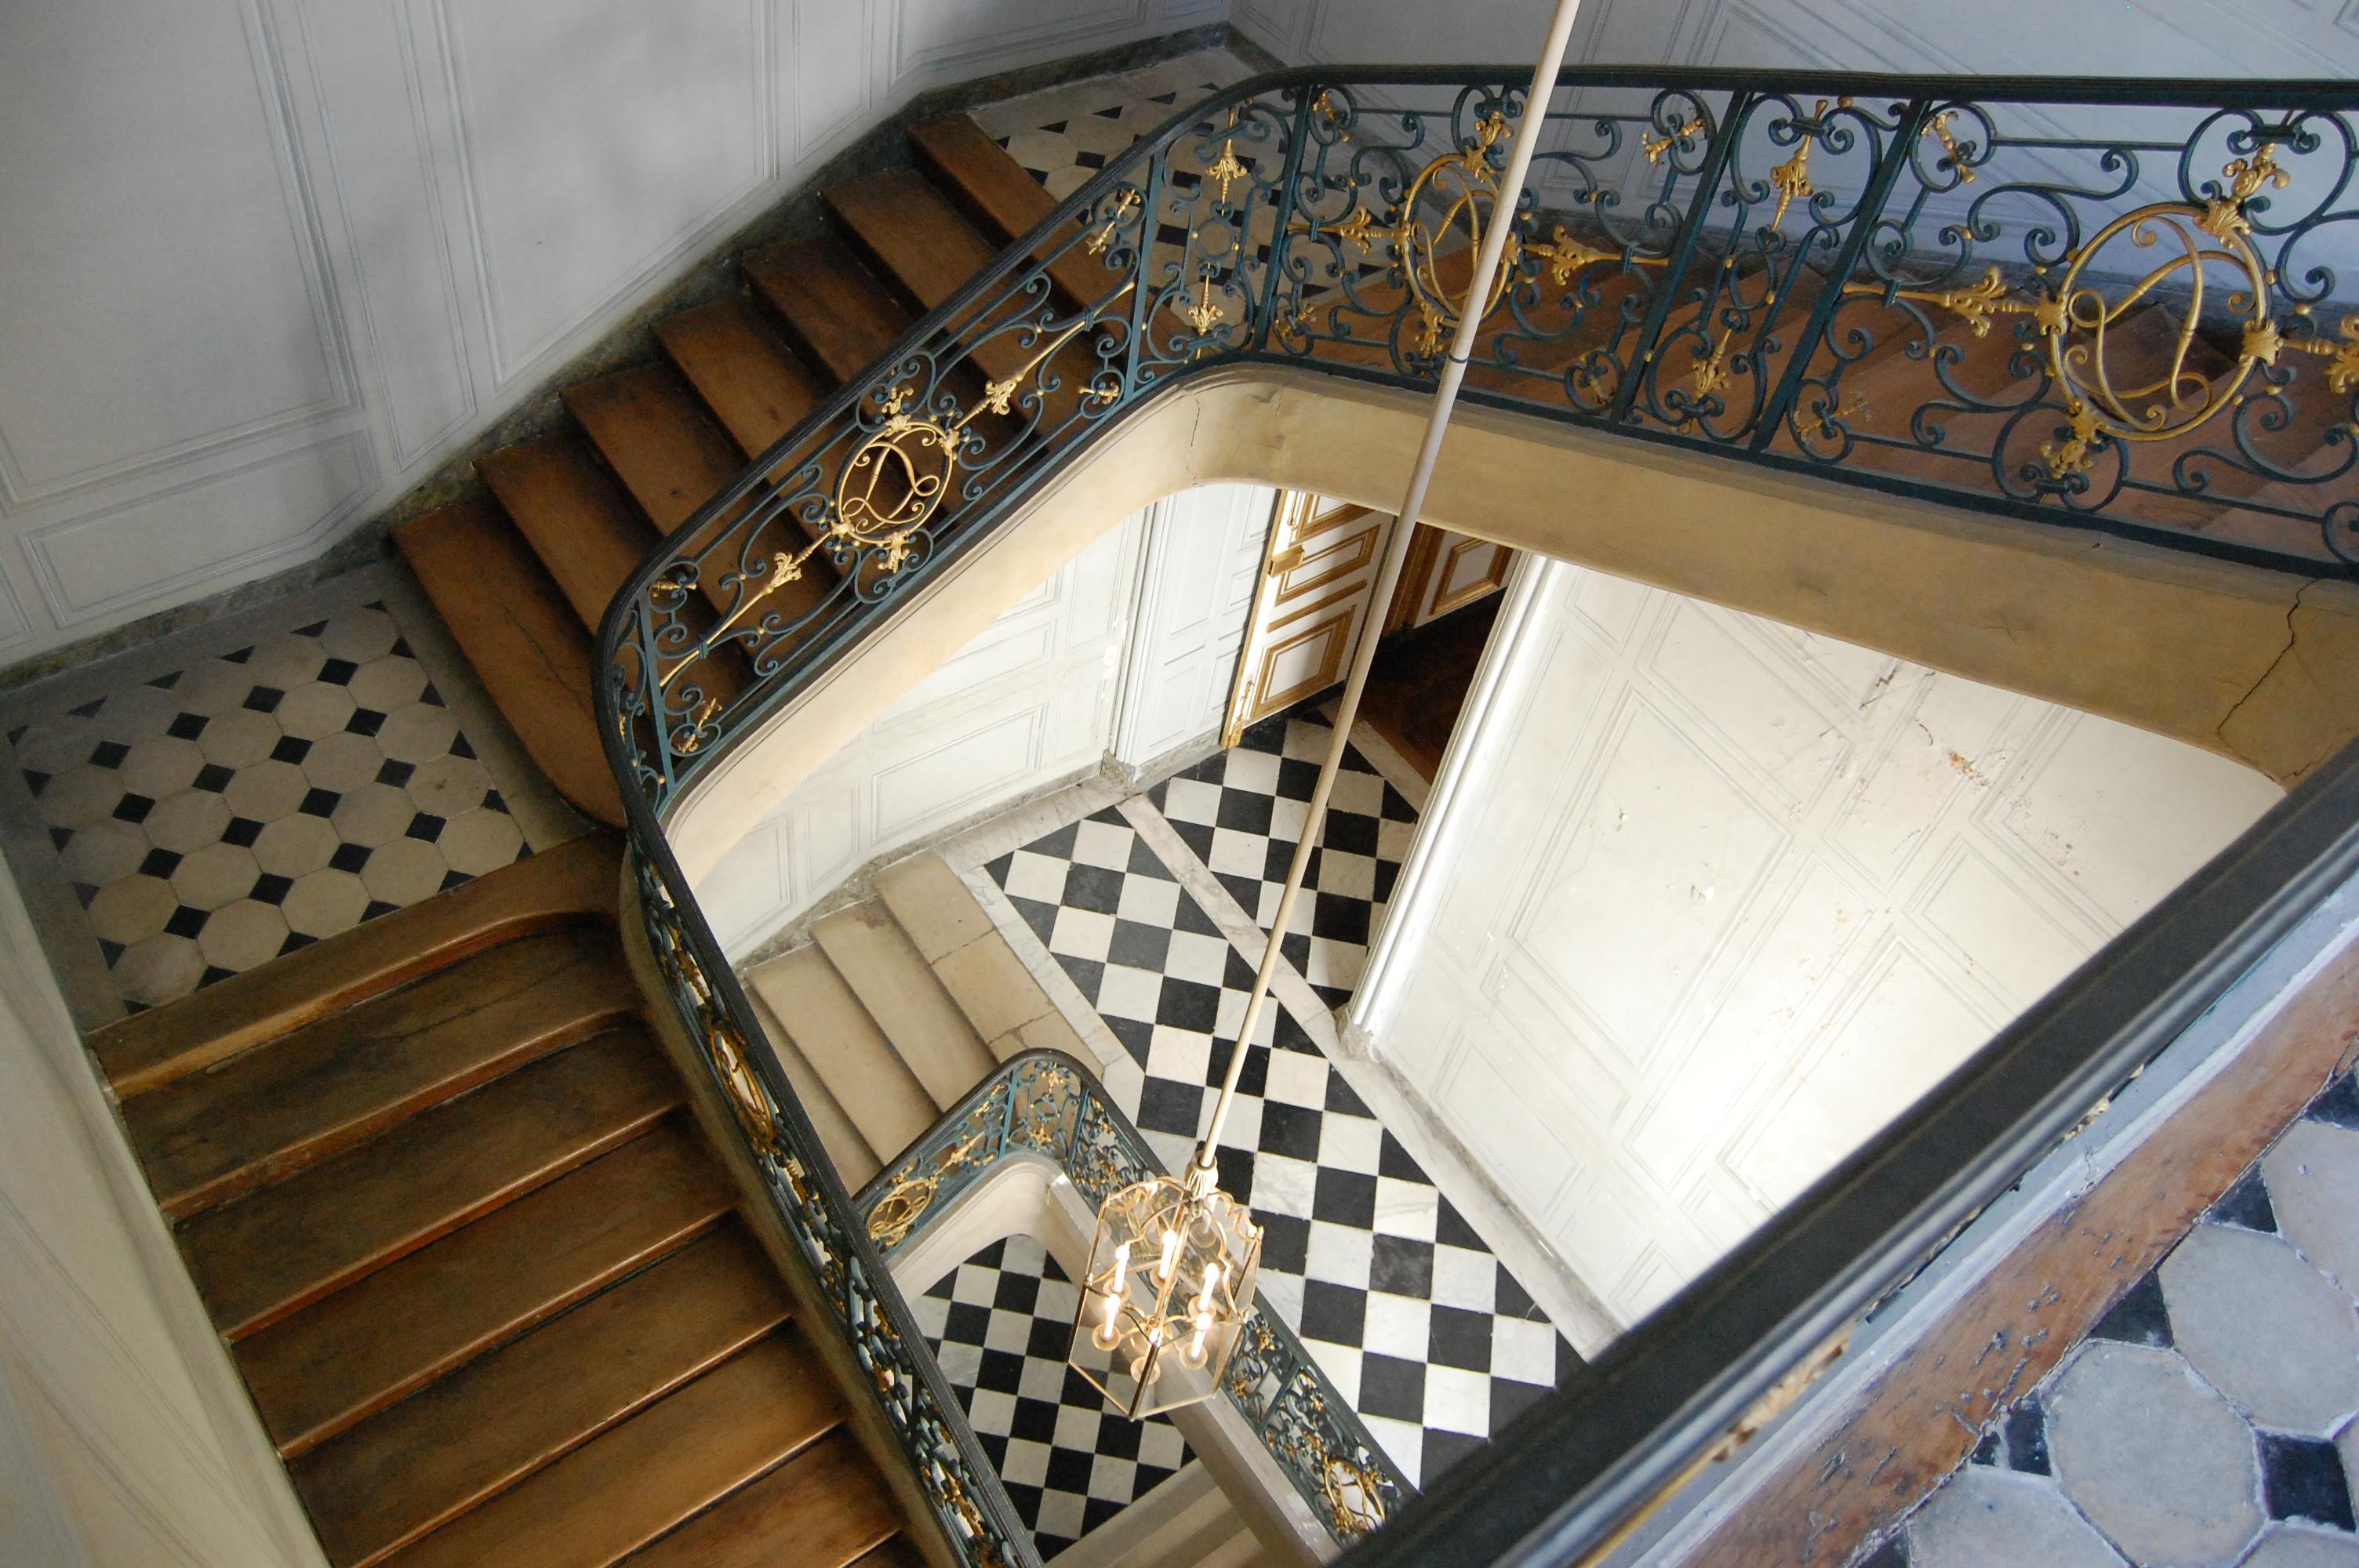 file escalier priv de louis xv dsc 0398 jpg wikimedia. Black Bedroom Furniture Sets. Home Design Ideas